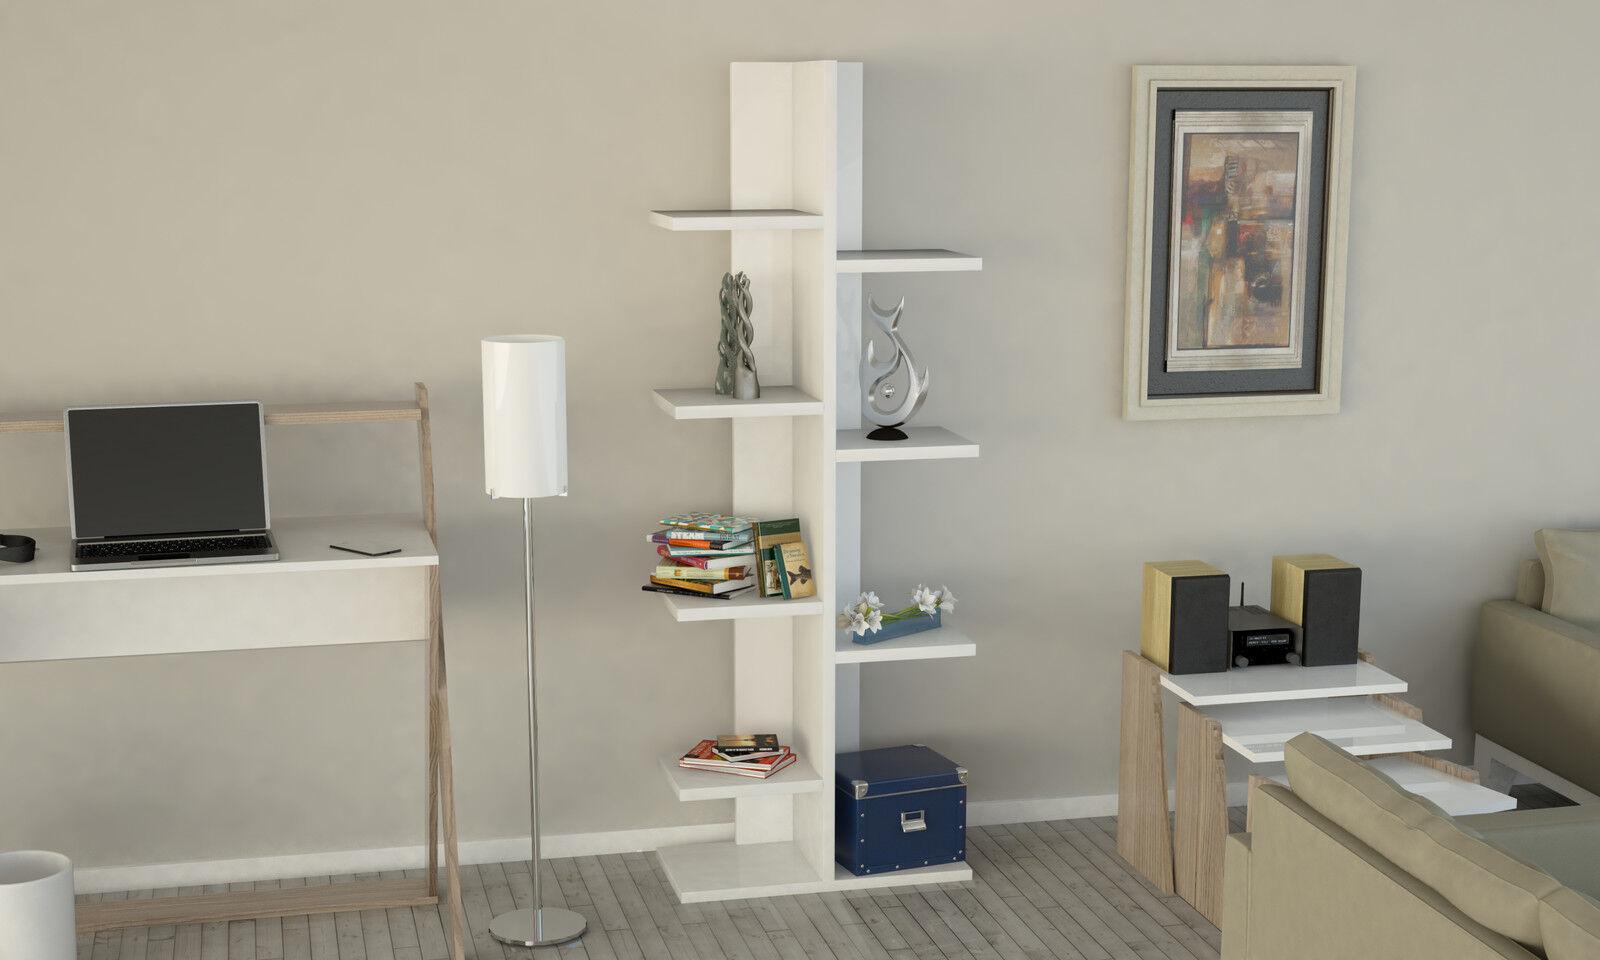 Furniture Limited